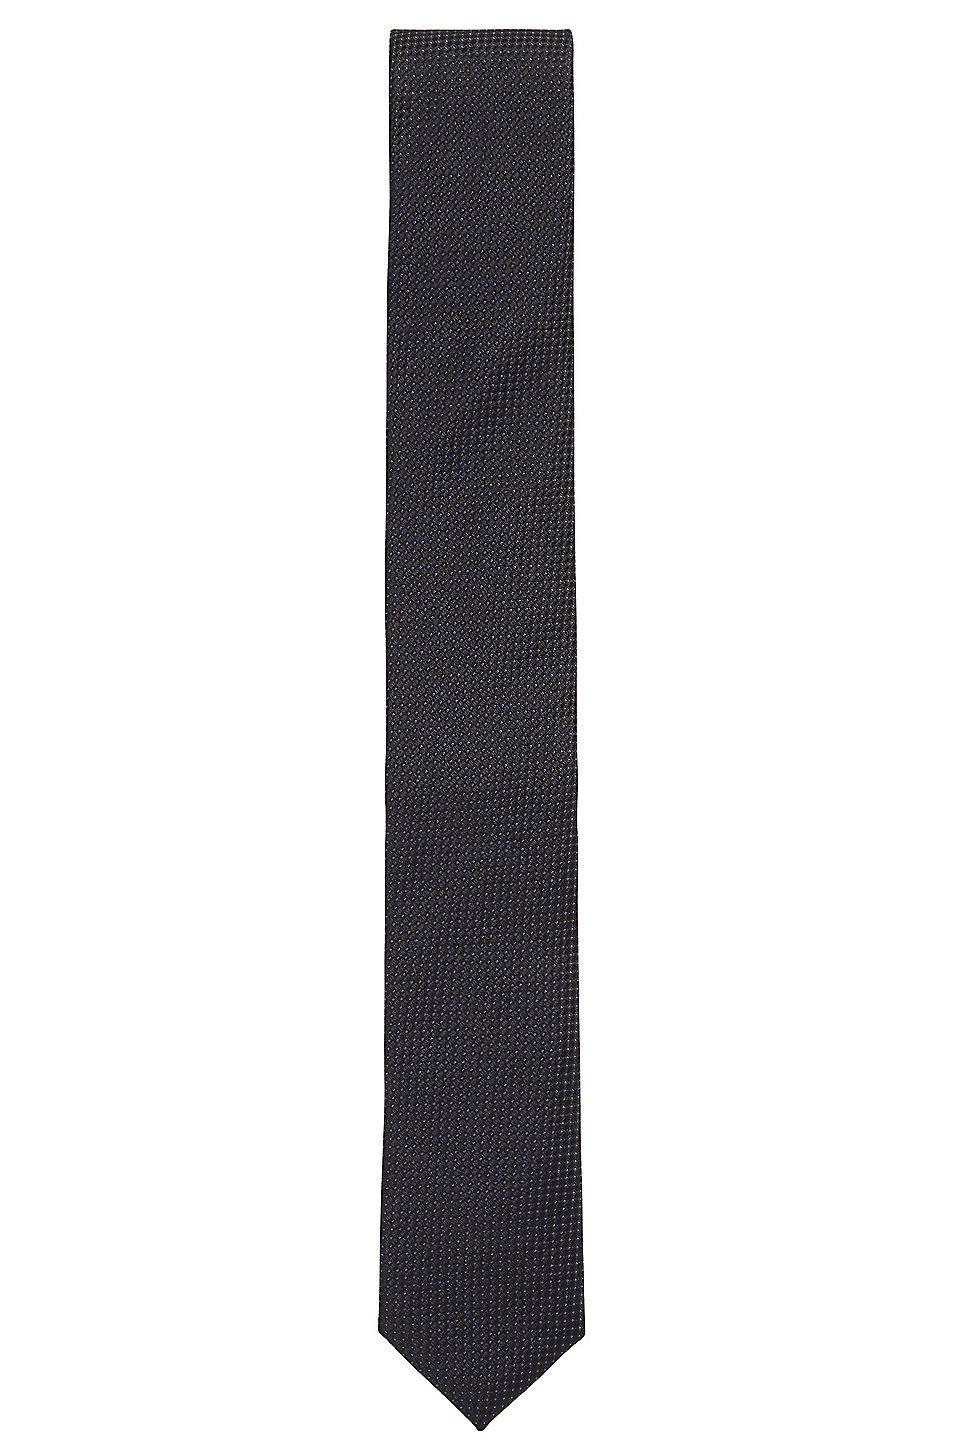 e97a95d6b6 BOSS - Italian-made tie in micro-pattern silk jacquard